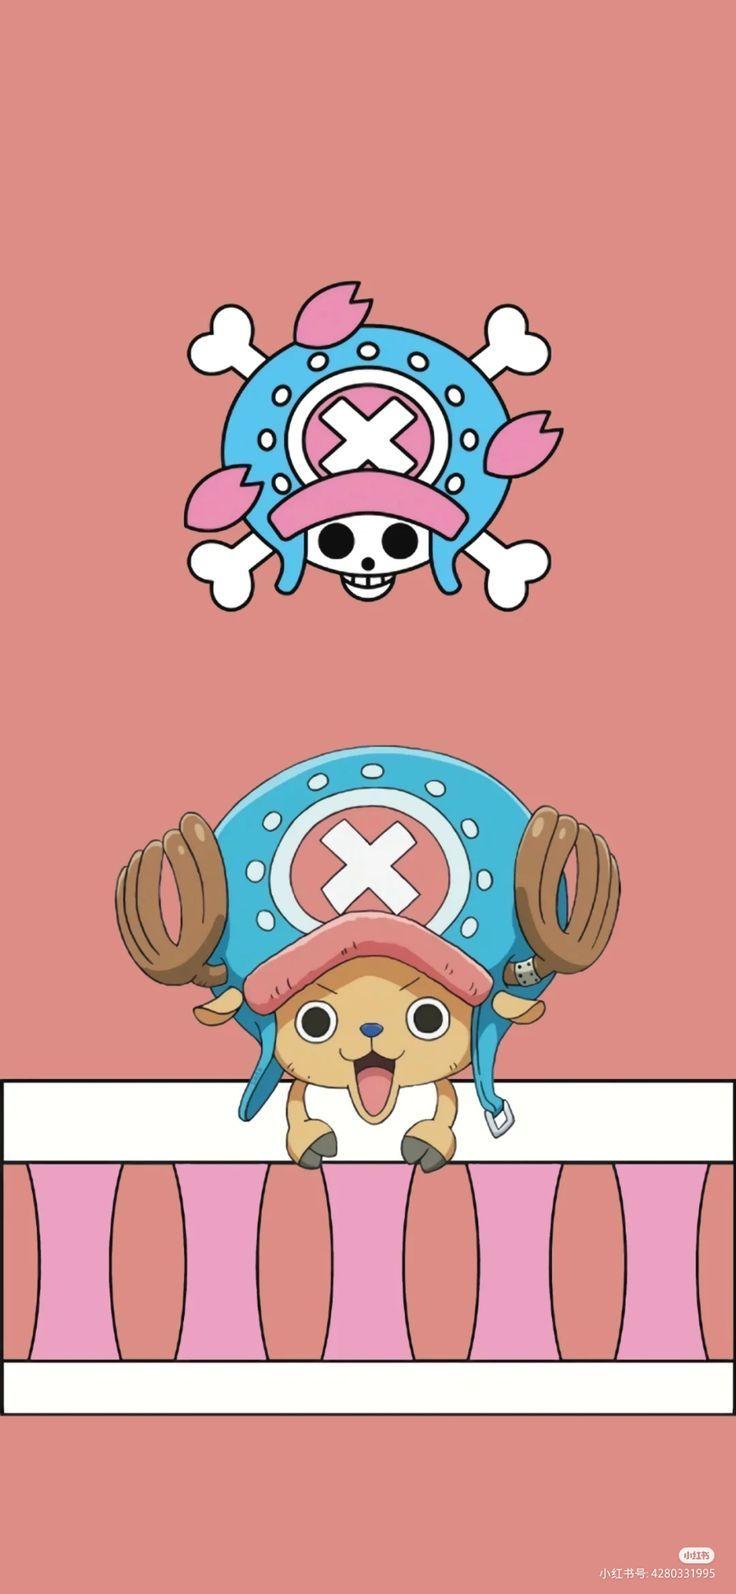 One Piece Roronoa Zoro Figurine Compilation Part 4